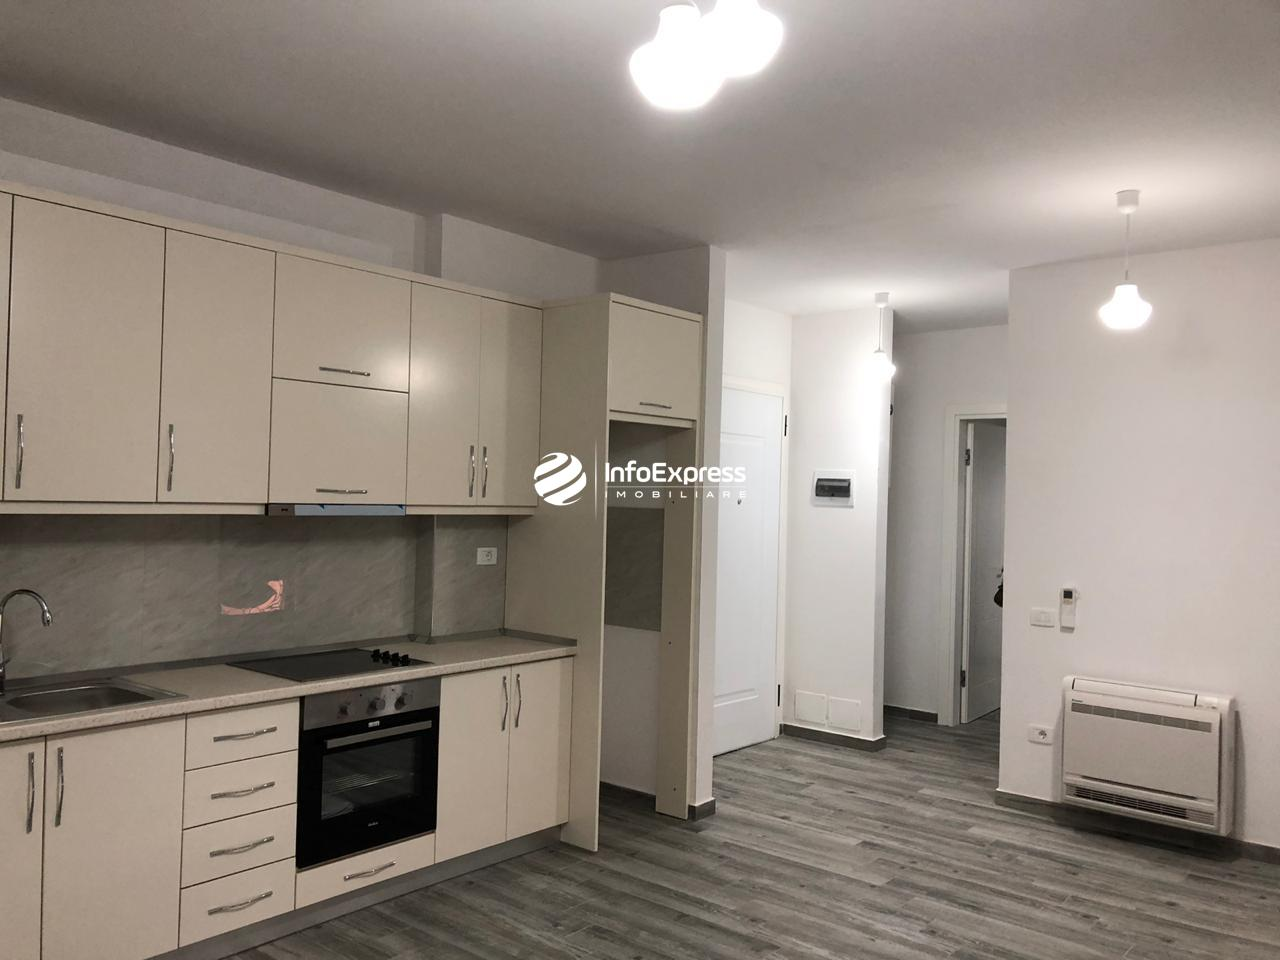 TRR-0618-1316 Jepet me qera apartament 1+1